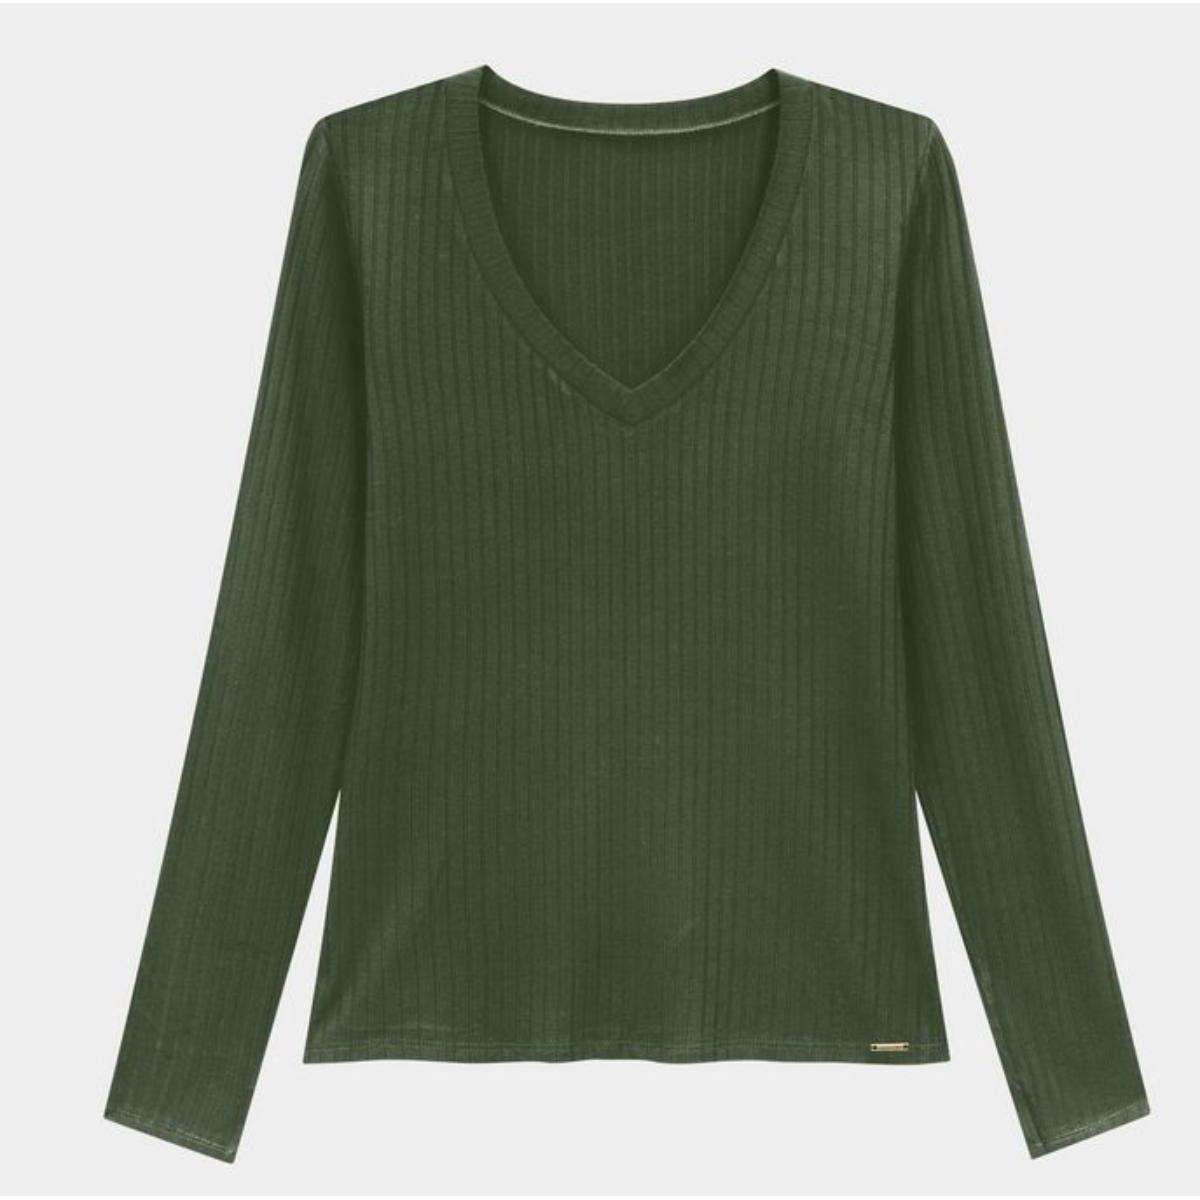 Blusa Feminina Lunender 00344 Verde